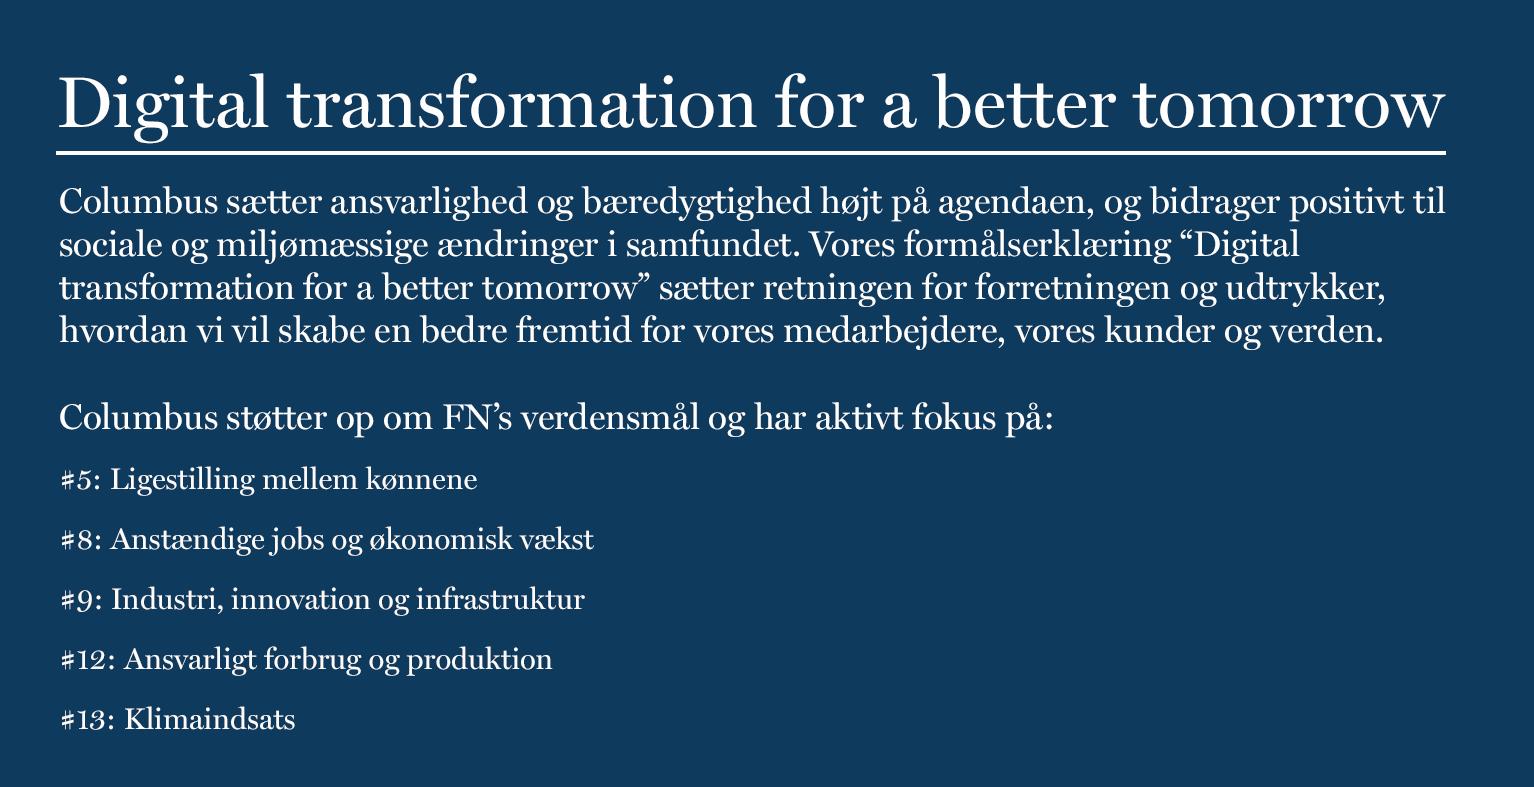 Digital transformation for a better tomorrow